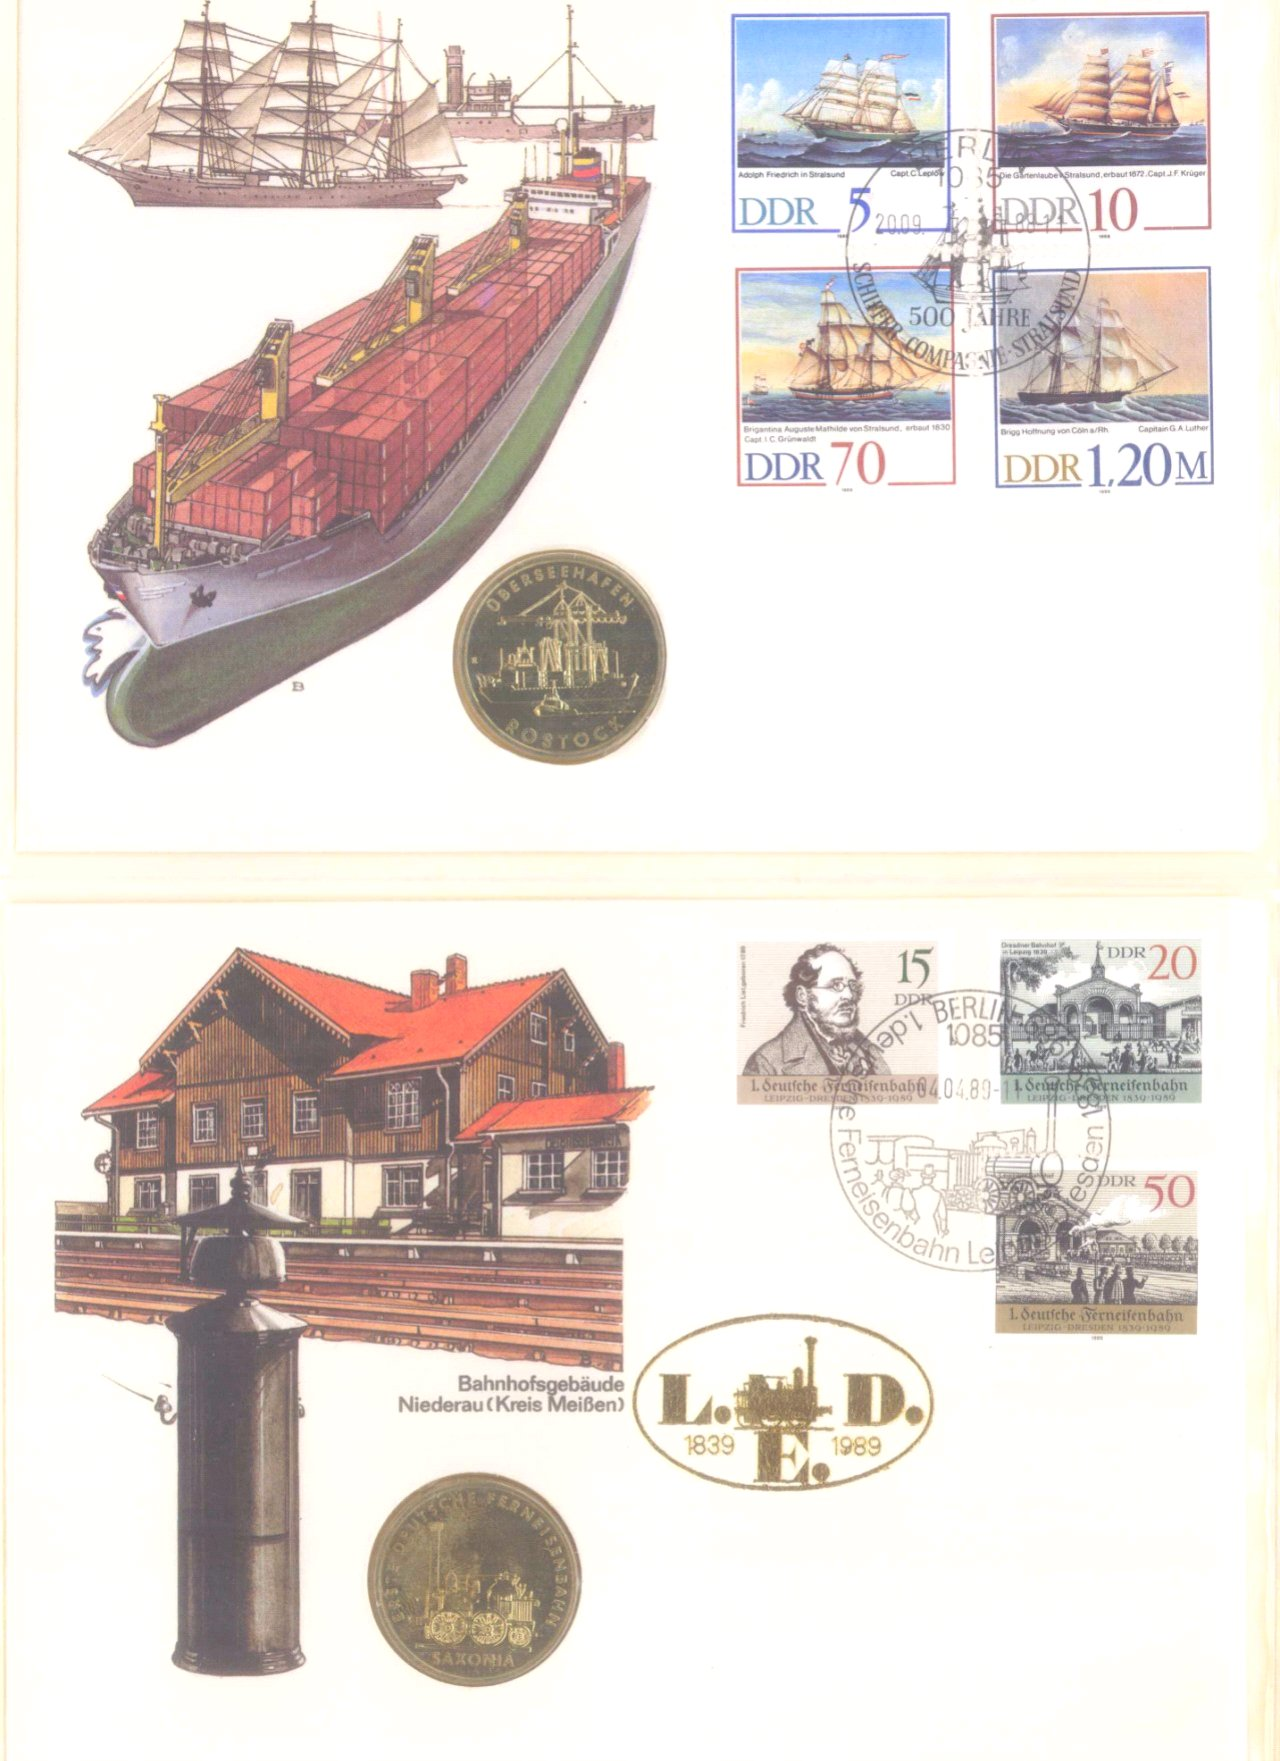 Sammlung Borek Numisbriefe im Ringbinder-16